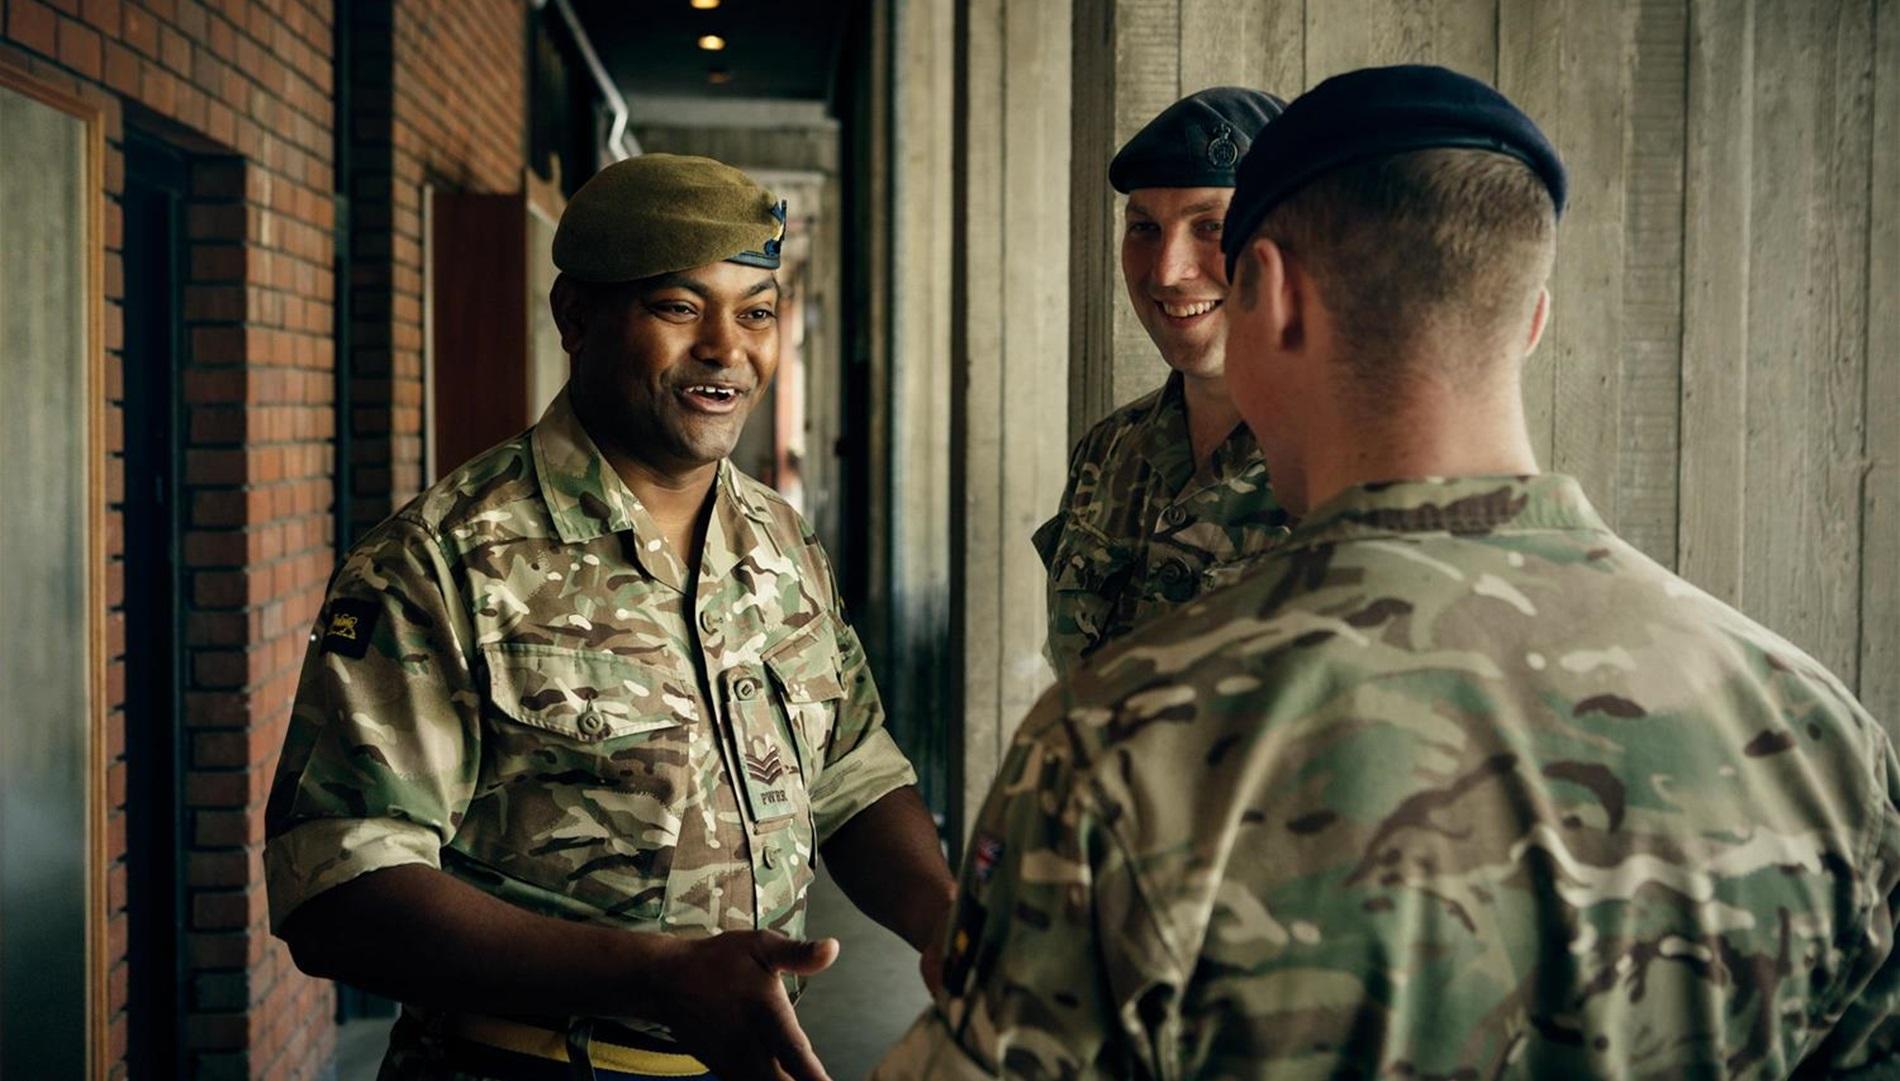 Johnson Beharry meeting fellow Army personnel